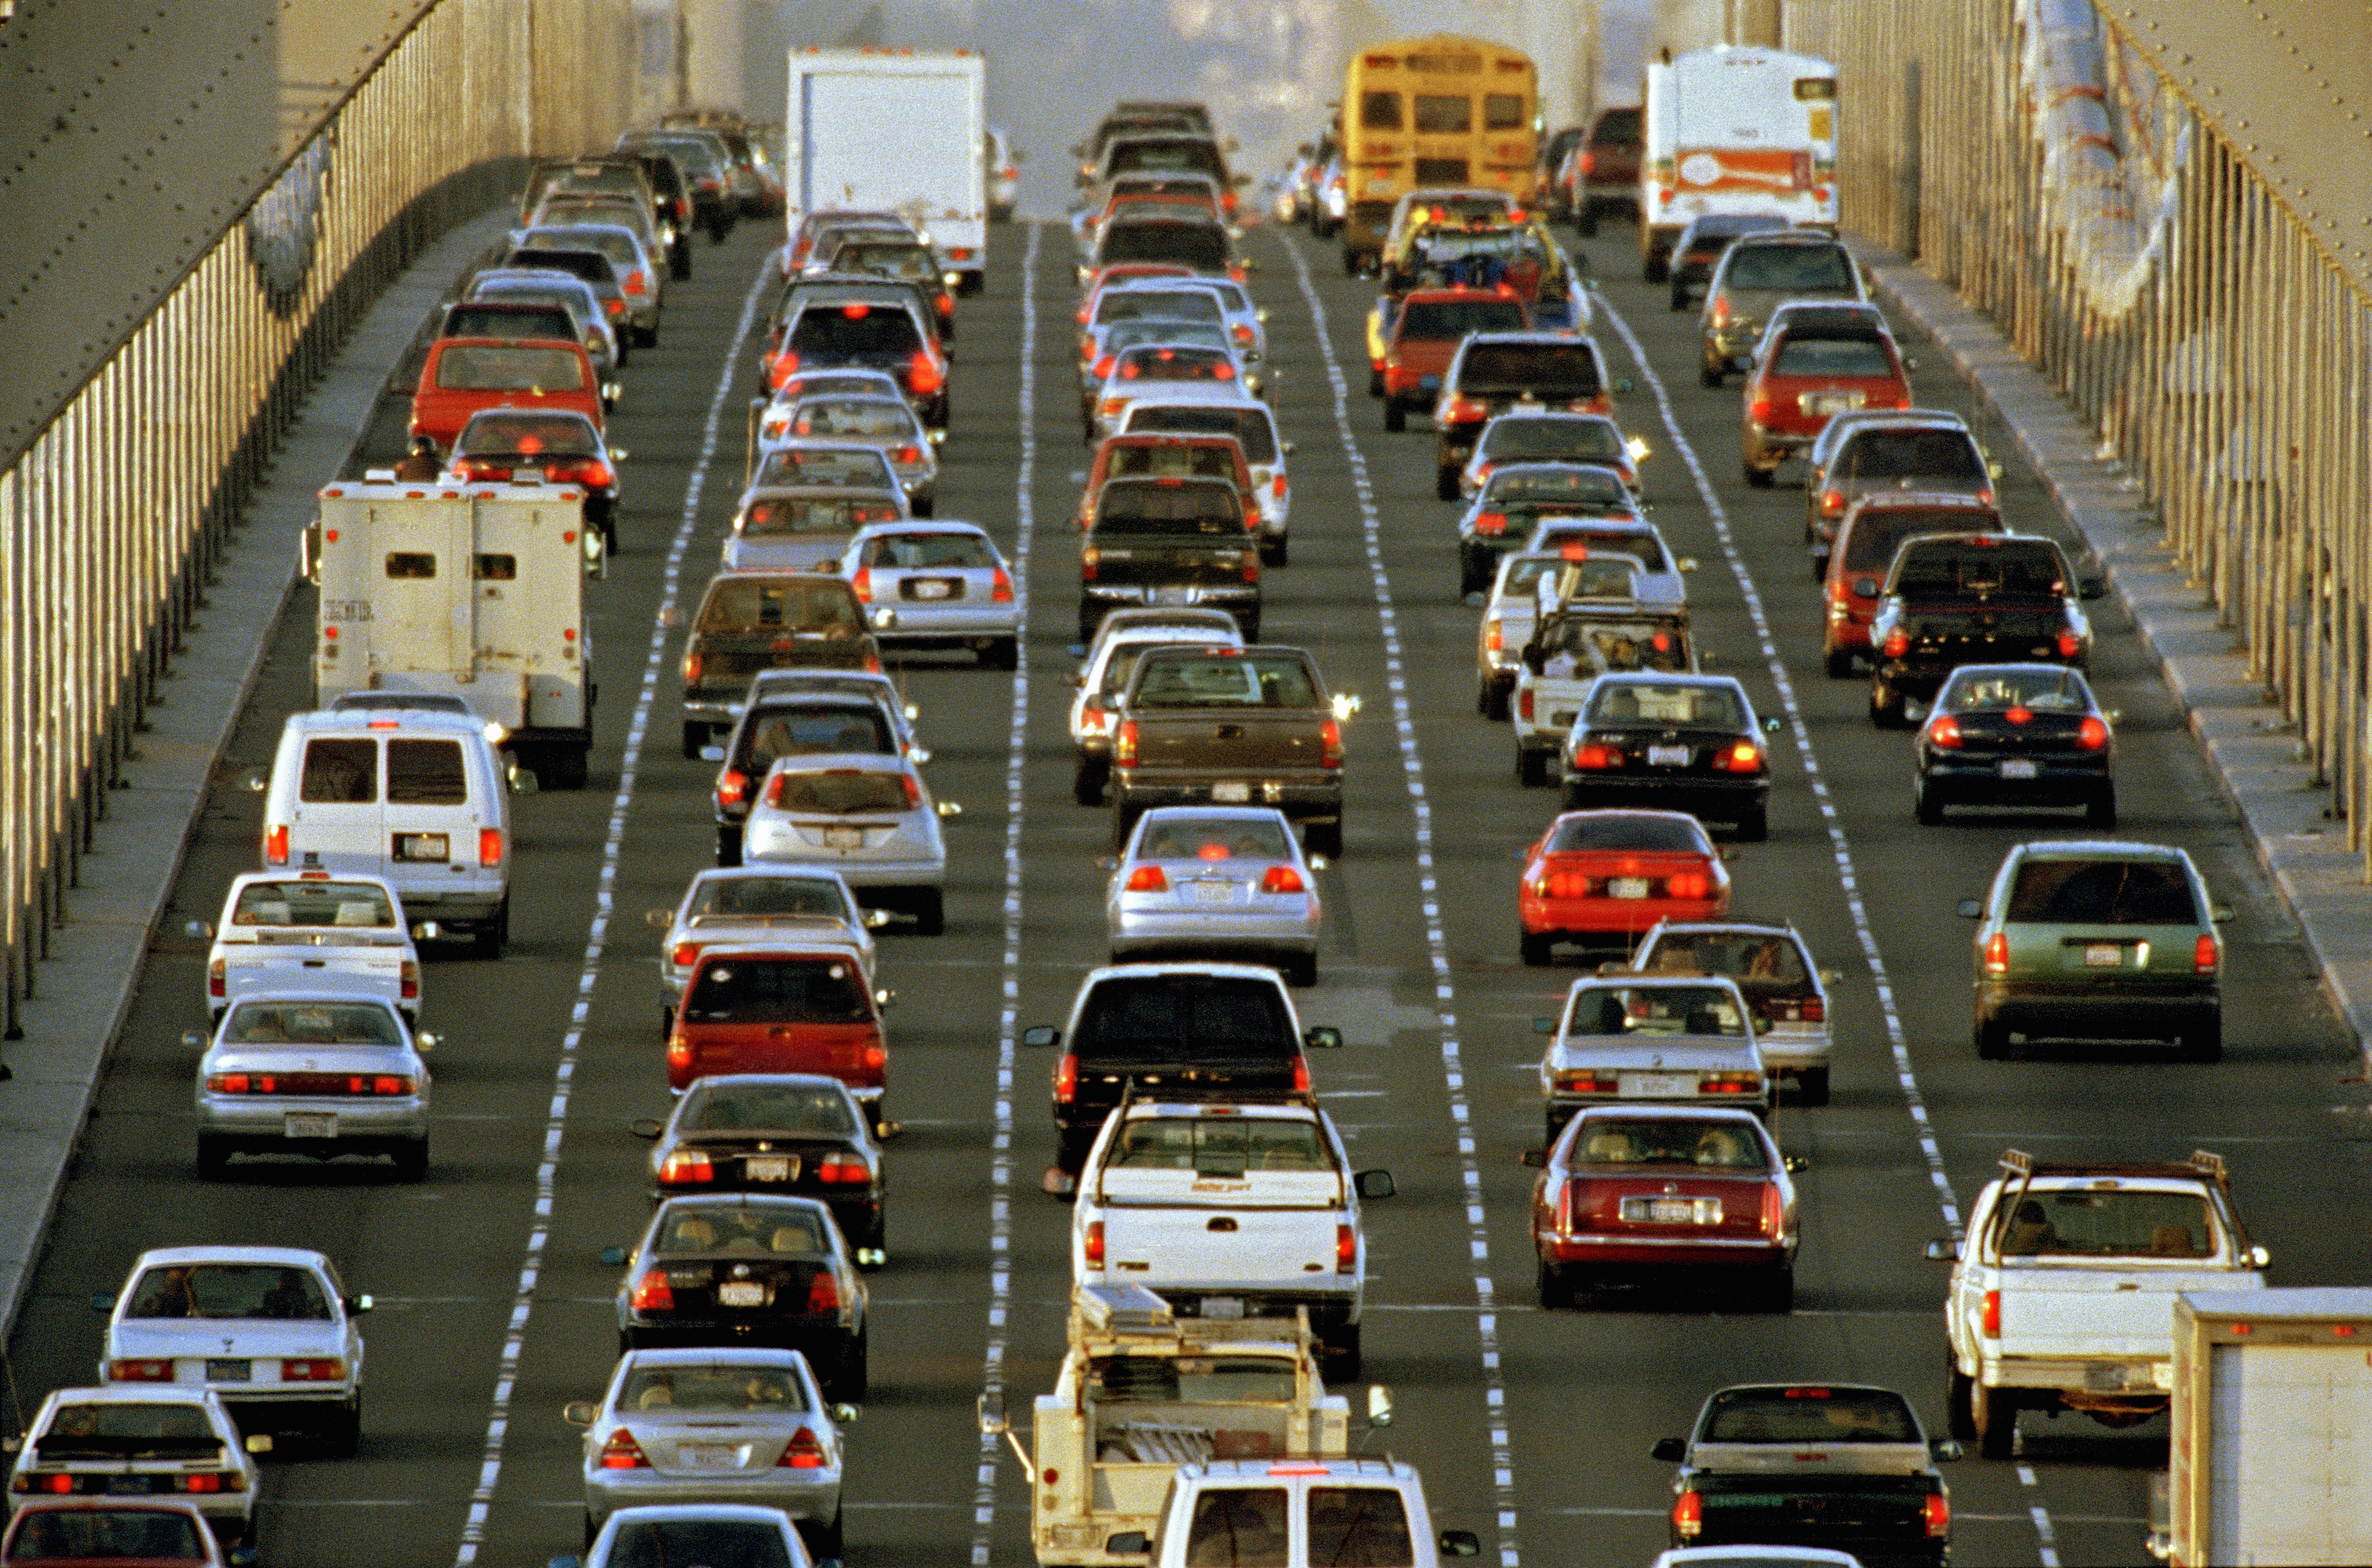 Criteo founder raises $19 million for ride-sharing app Less